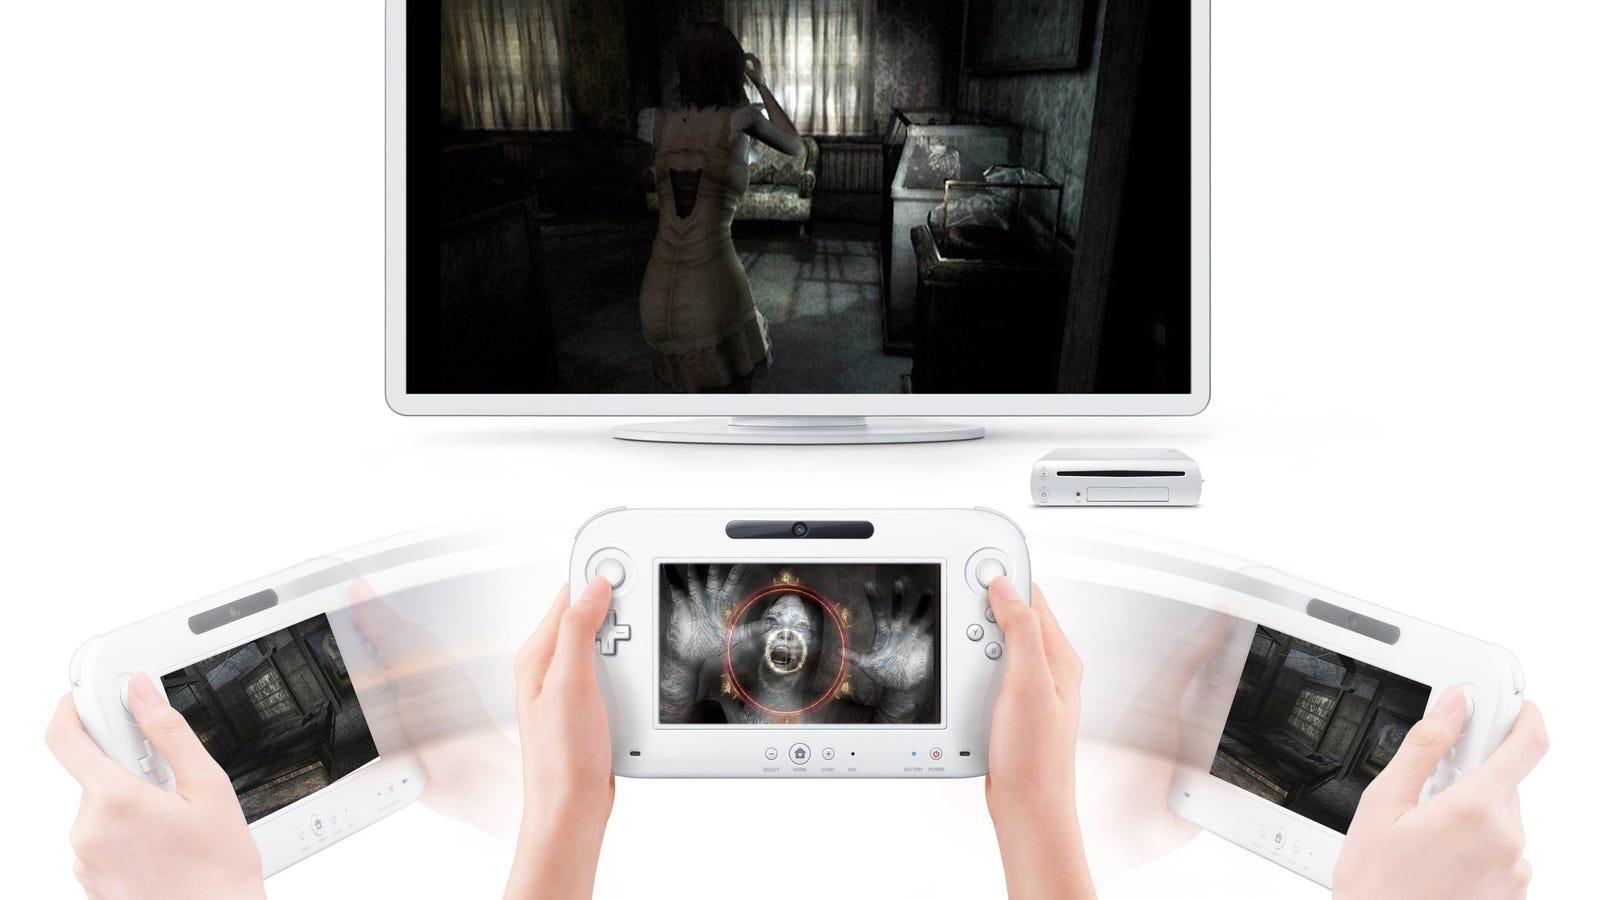 Großzügig Fatal Rahmen 2 Wii Fotos - Rahmen Ideen - markjohnsonshow.info